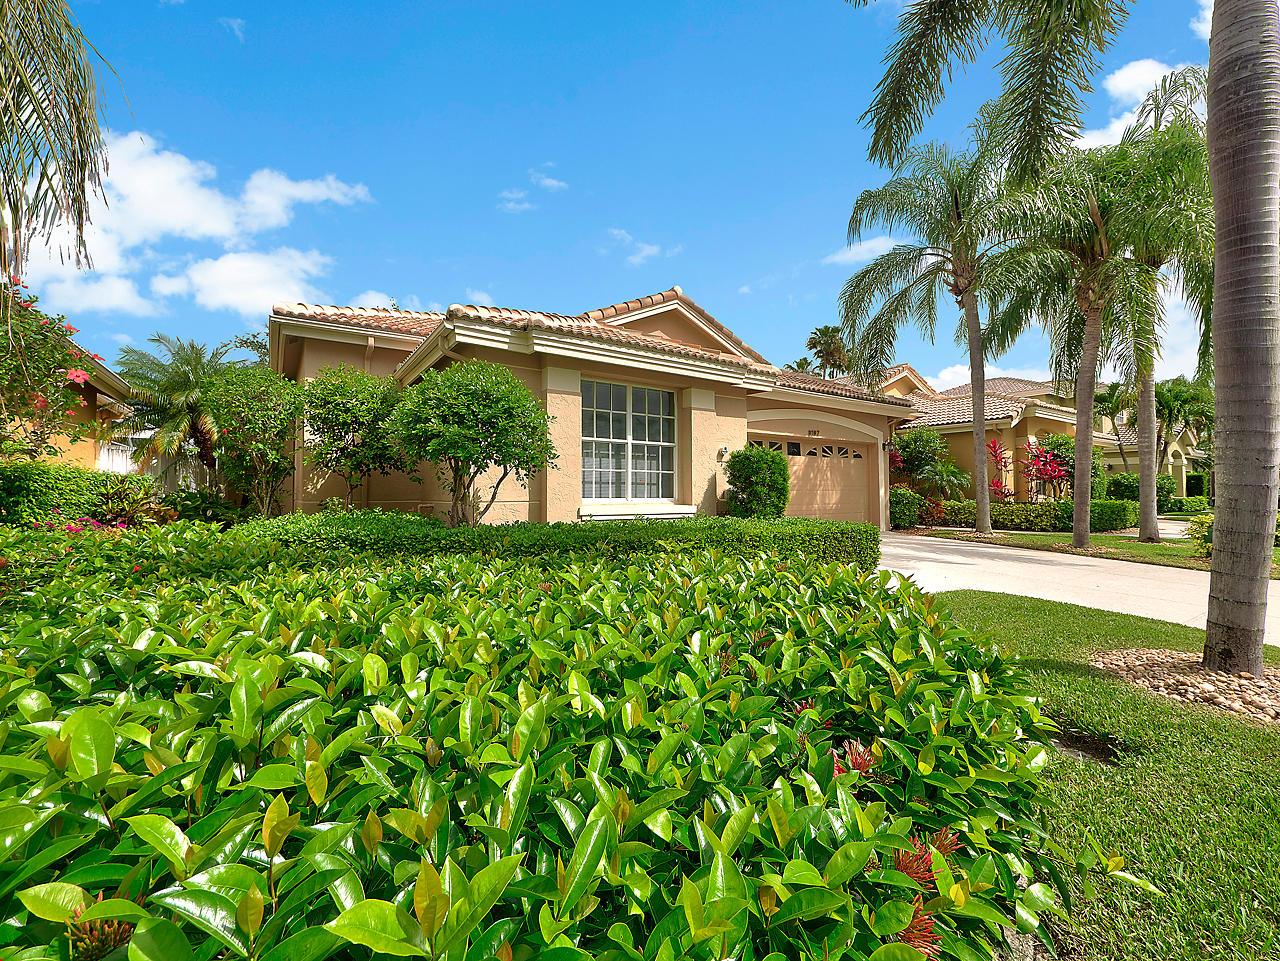 8197 Quail Meadow Way West Palm Beach,Florida 33412,3 Bedrooms Bedrooms,2 BathroomsBathrooms,A,Quail Meadow,RX-10415214